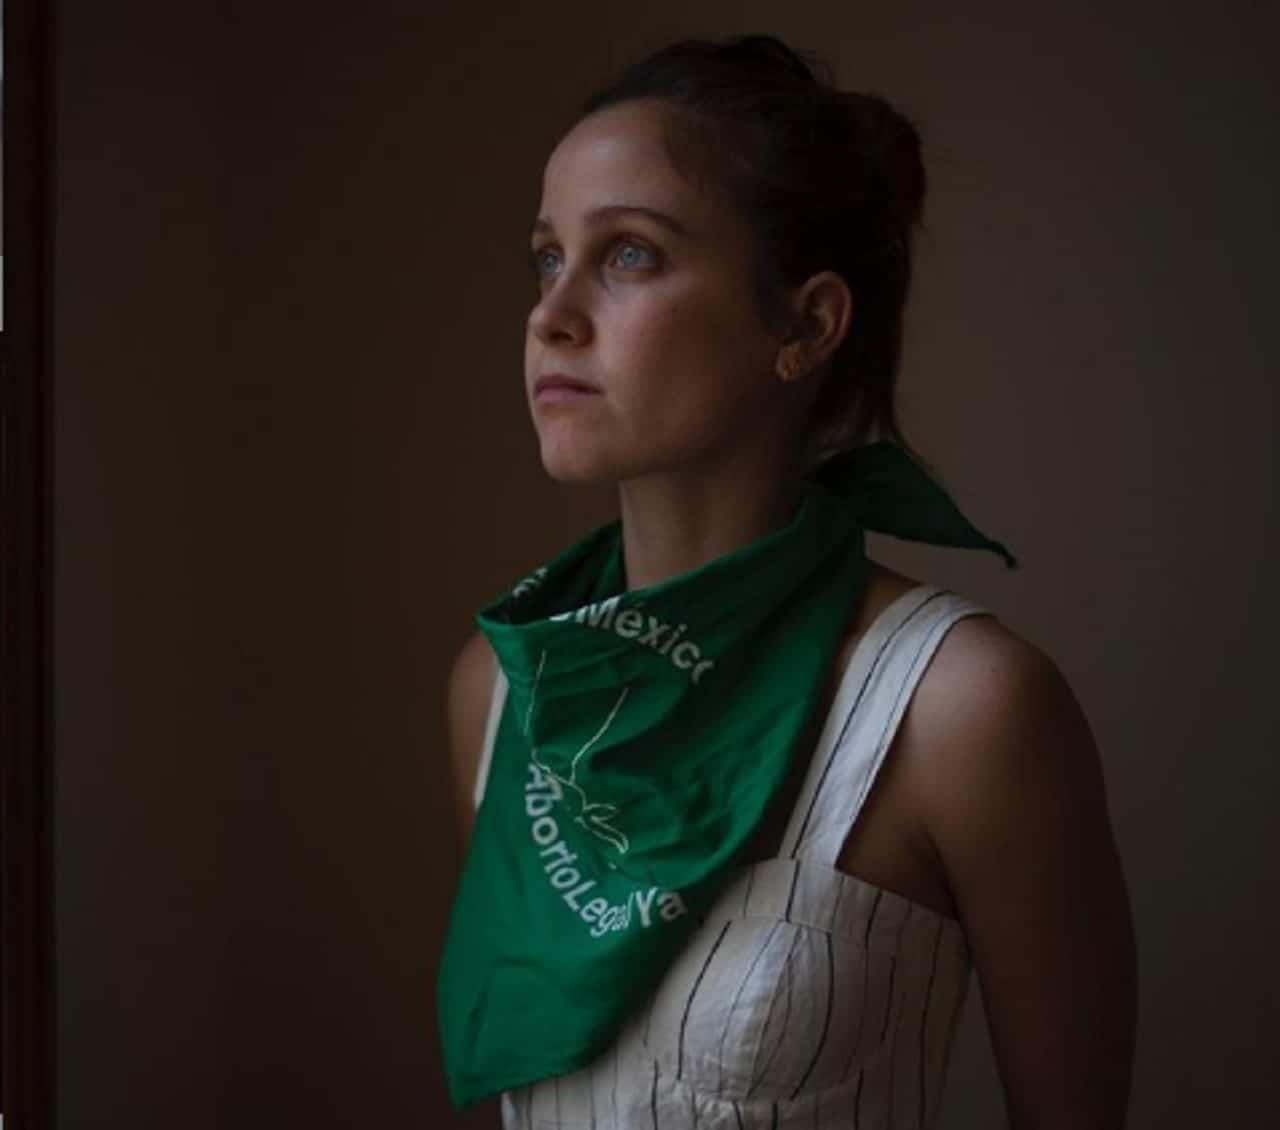 Mujeres famosas a favor del aborto legal México